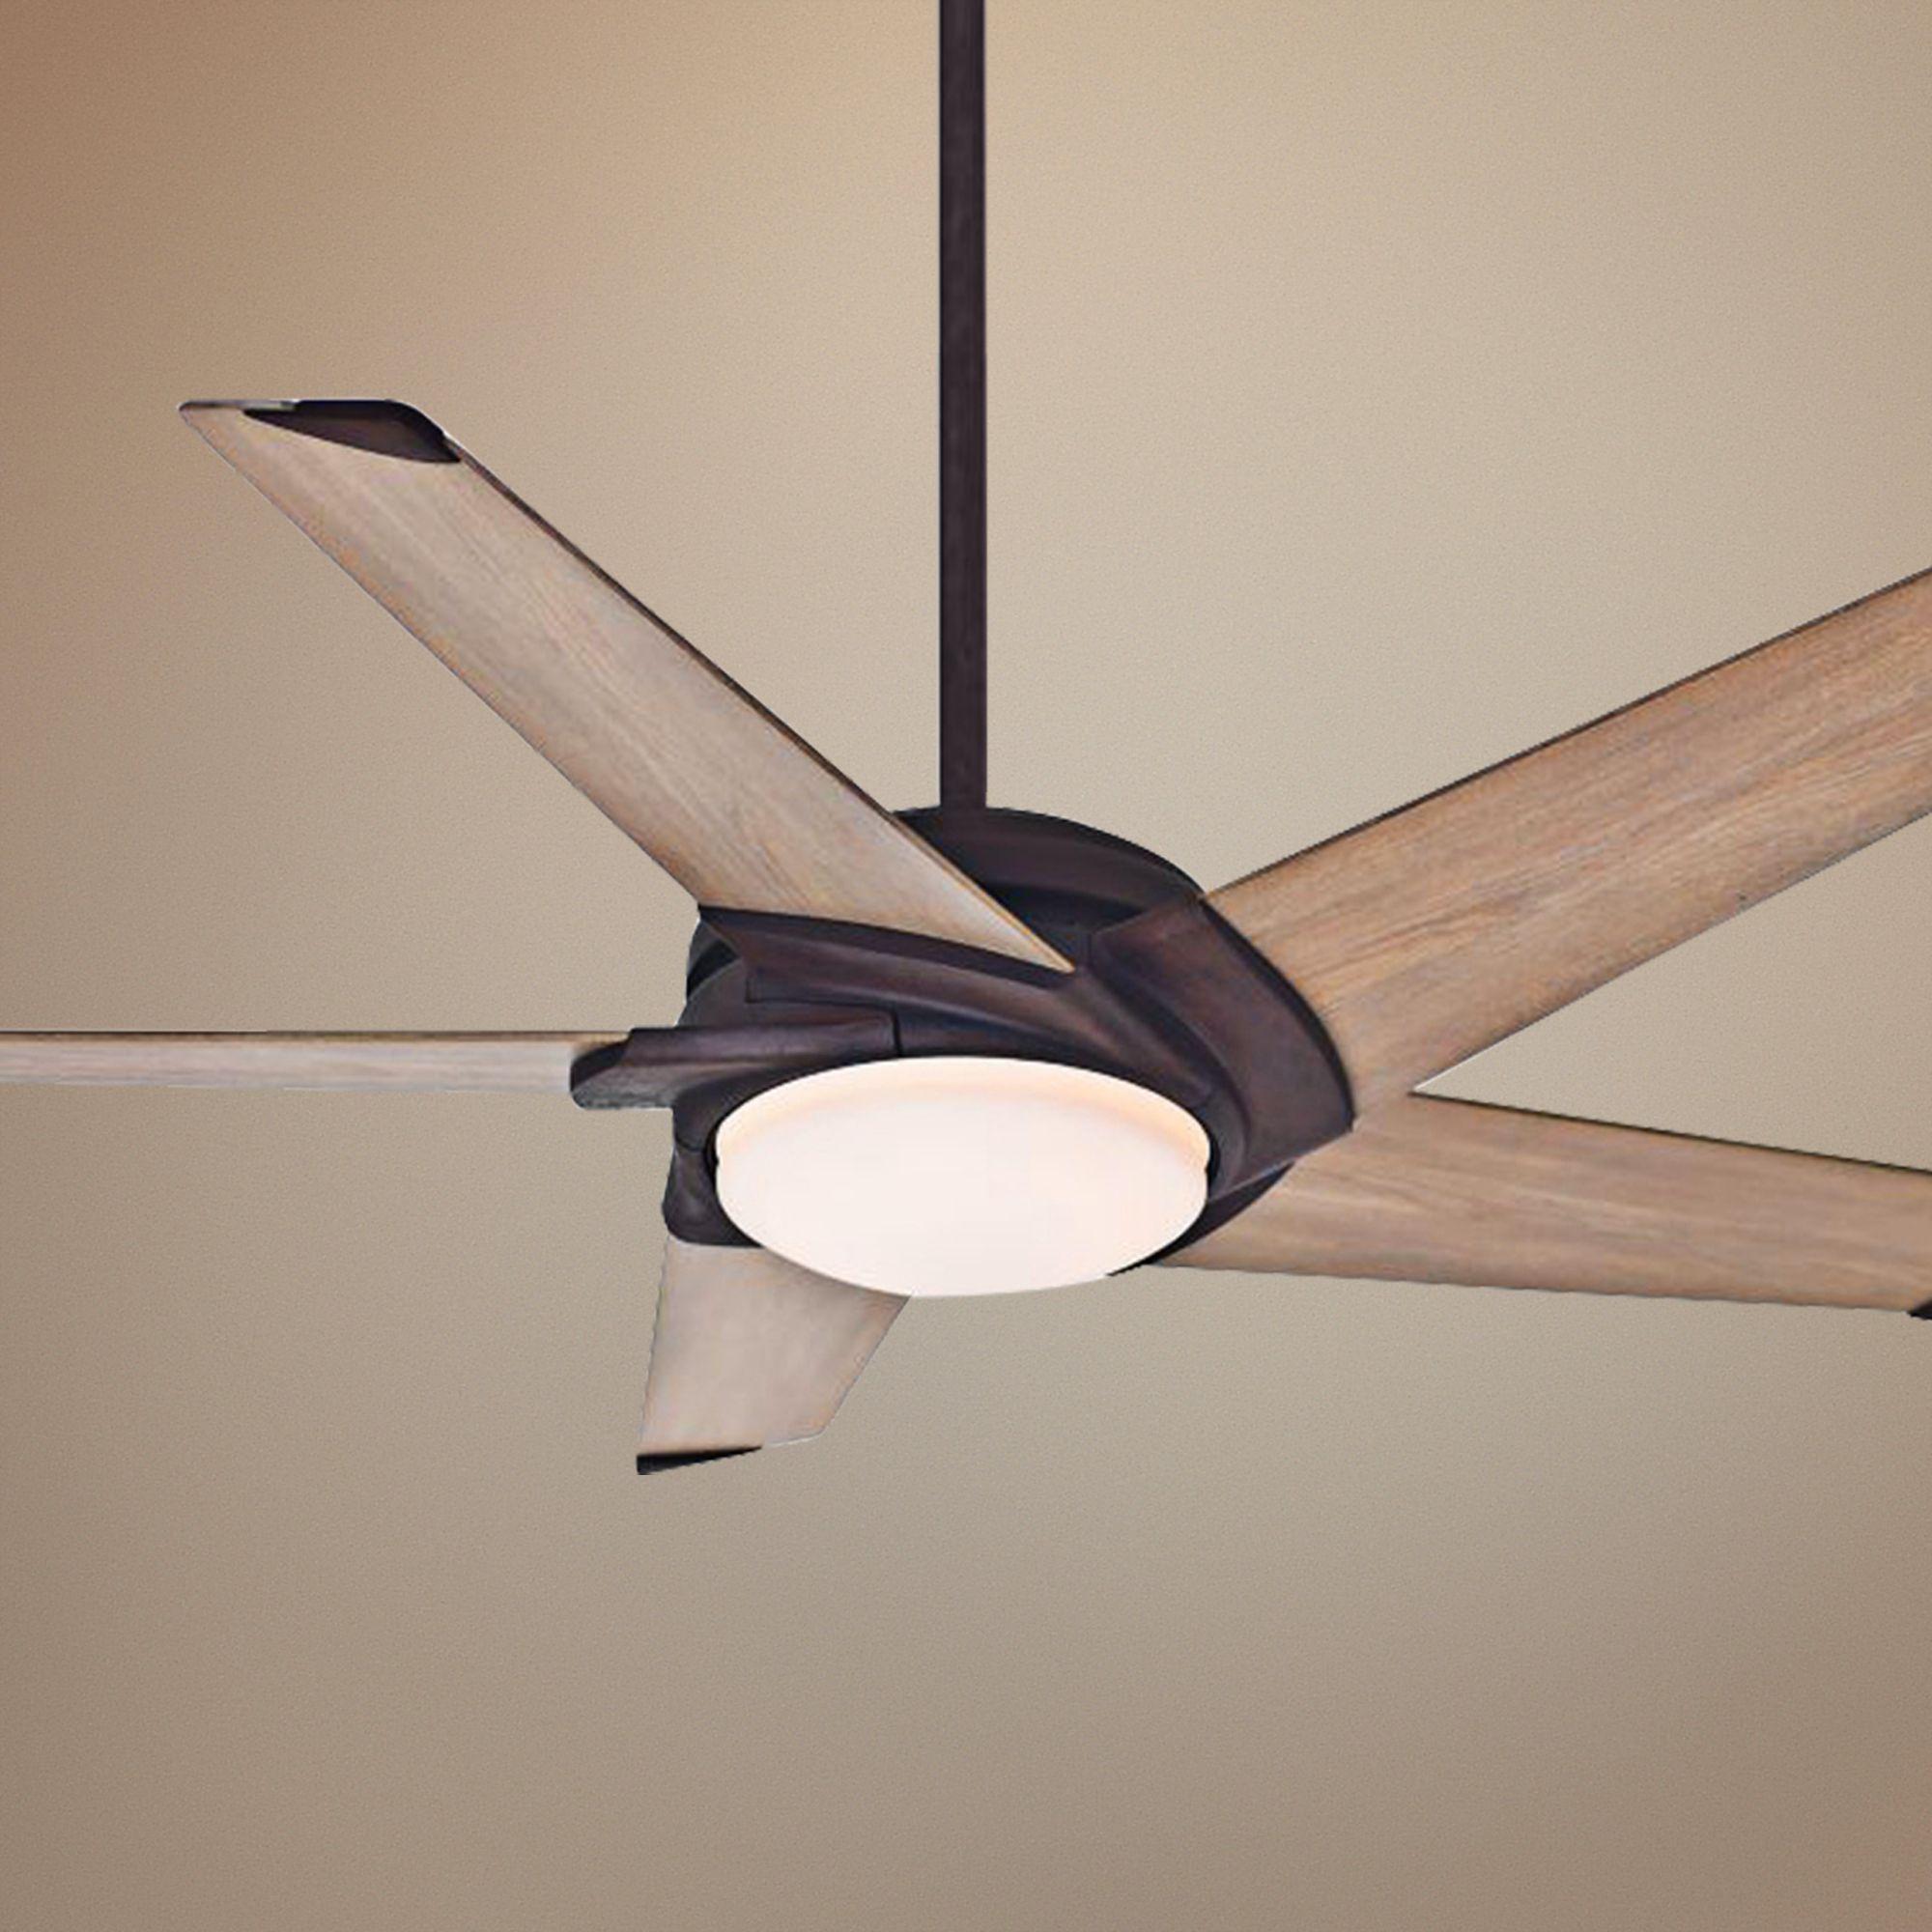 "Casablanca Stealth LED Ceiling Fan 54"" Industrial Rust"